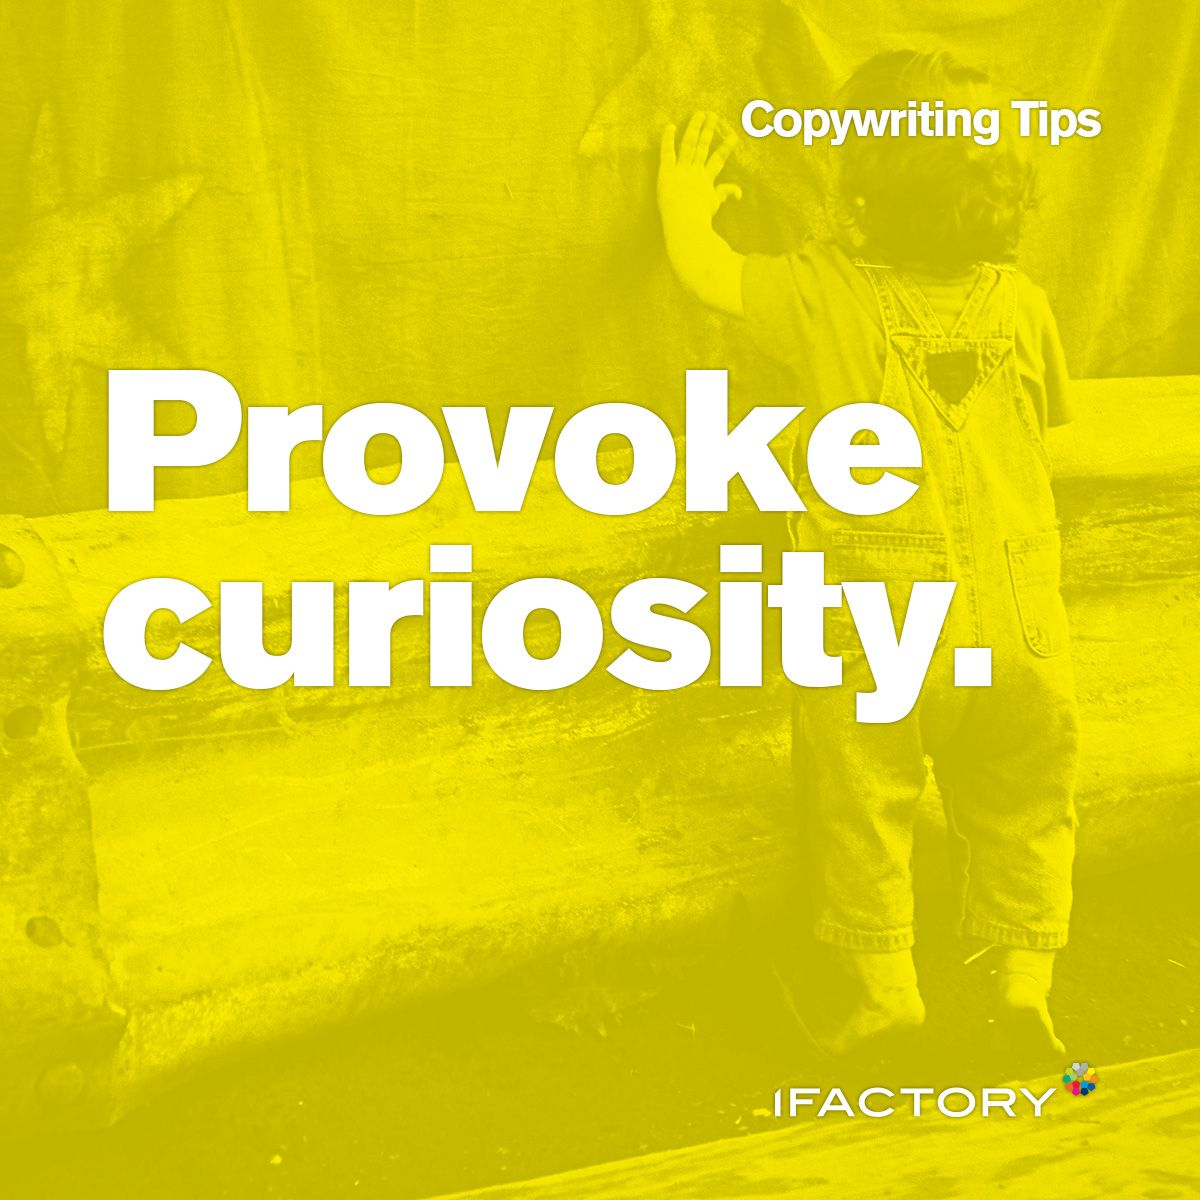 Copywriting Tips: Provoke curiosity #ifactory #digital #agency #bne #australia #provoke #tips #tricks #seo #copy #content #copywriting